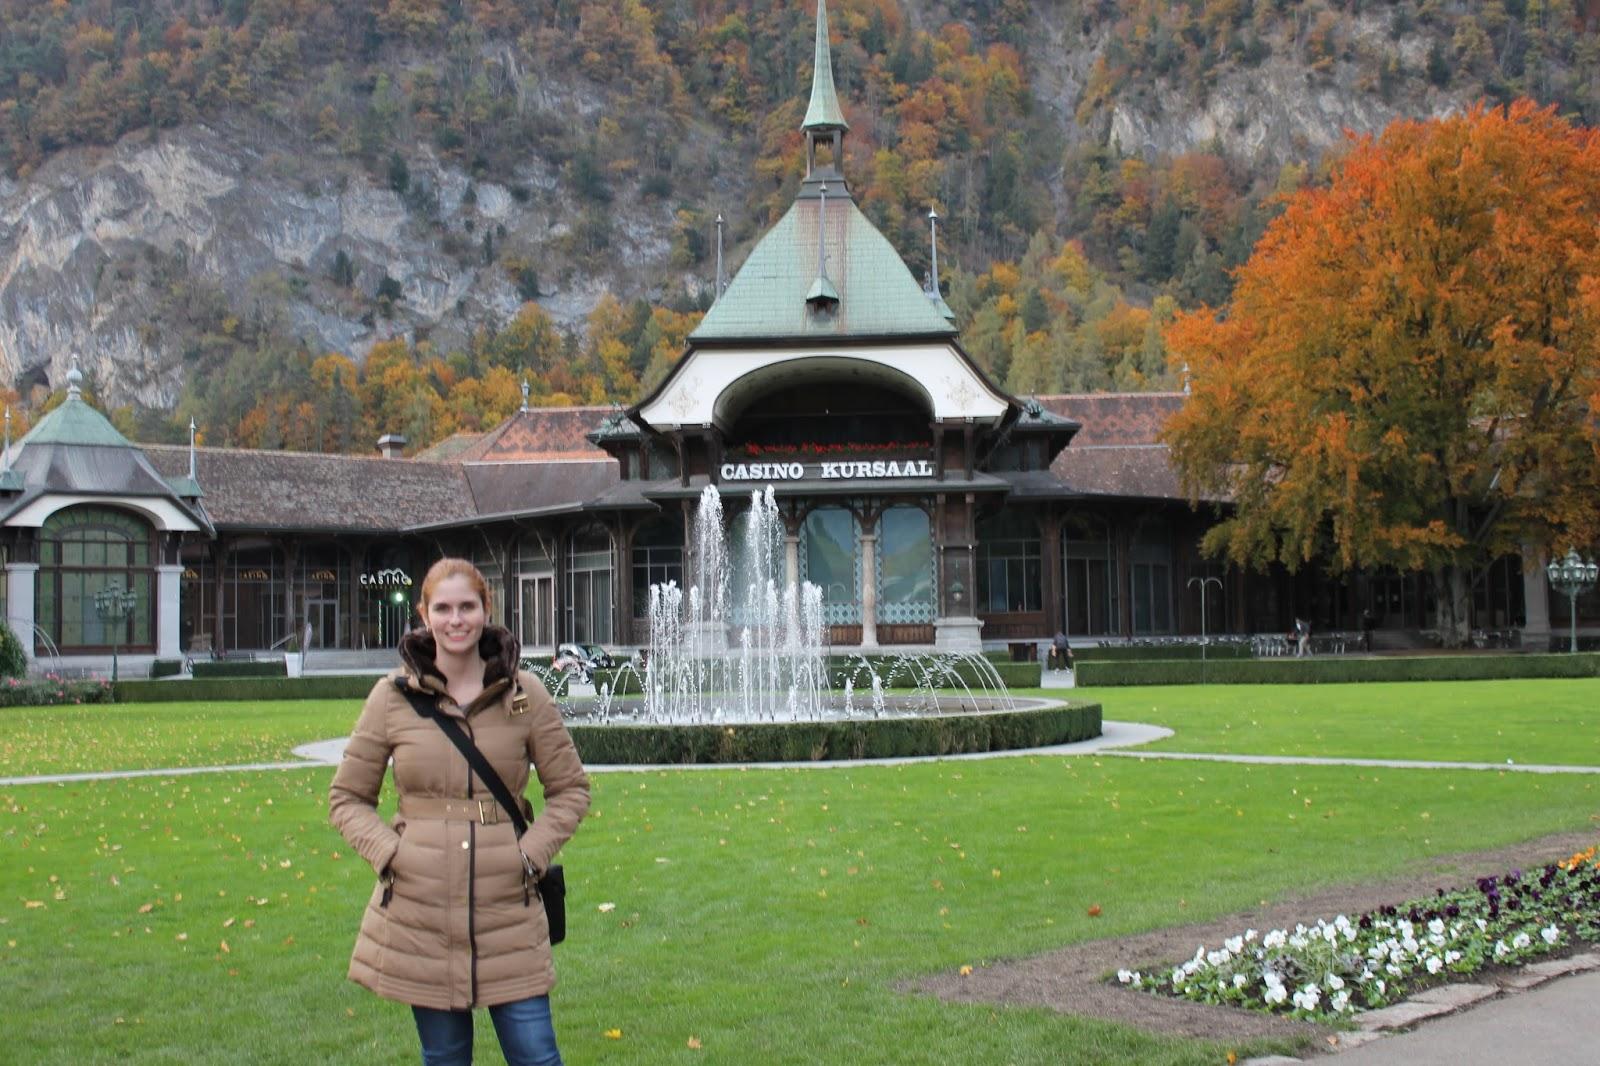 Casino Kursall - Interlaken